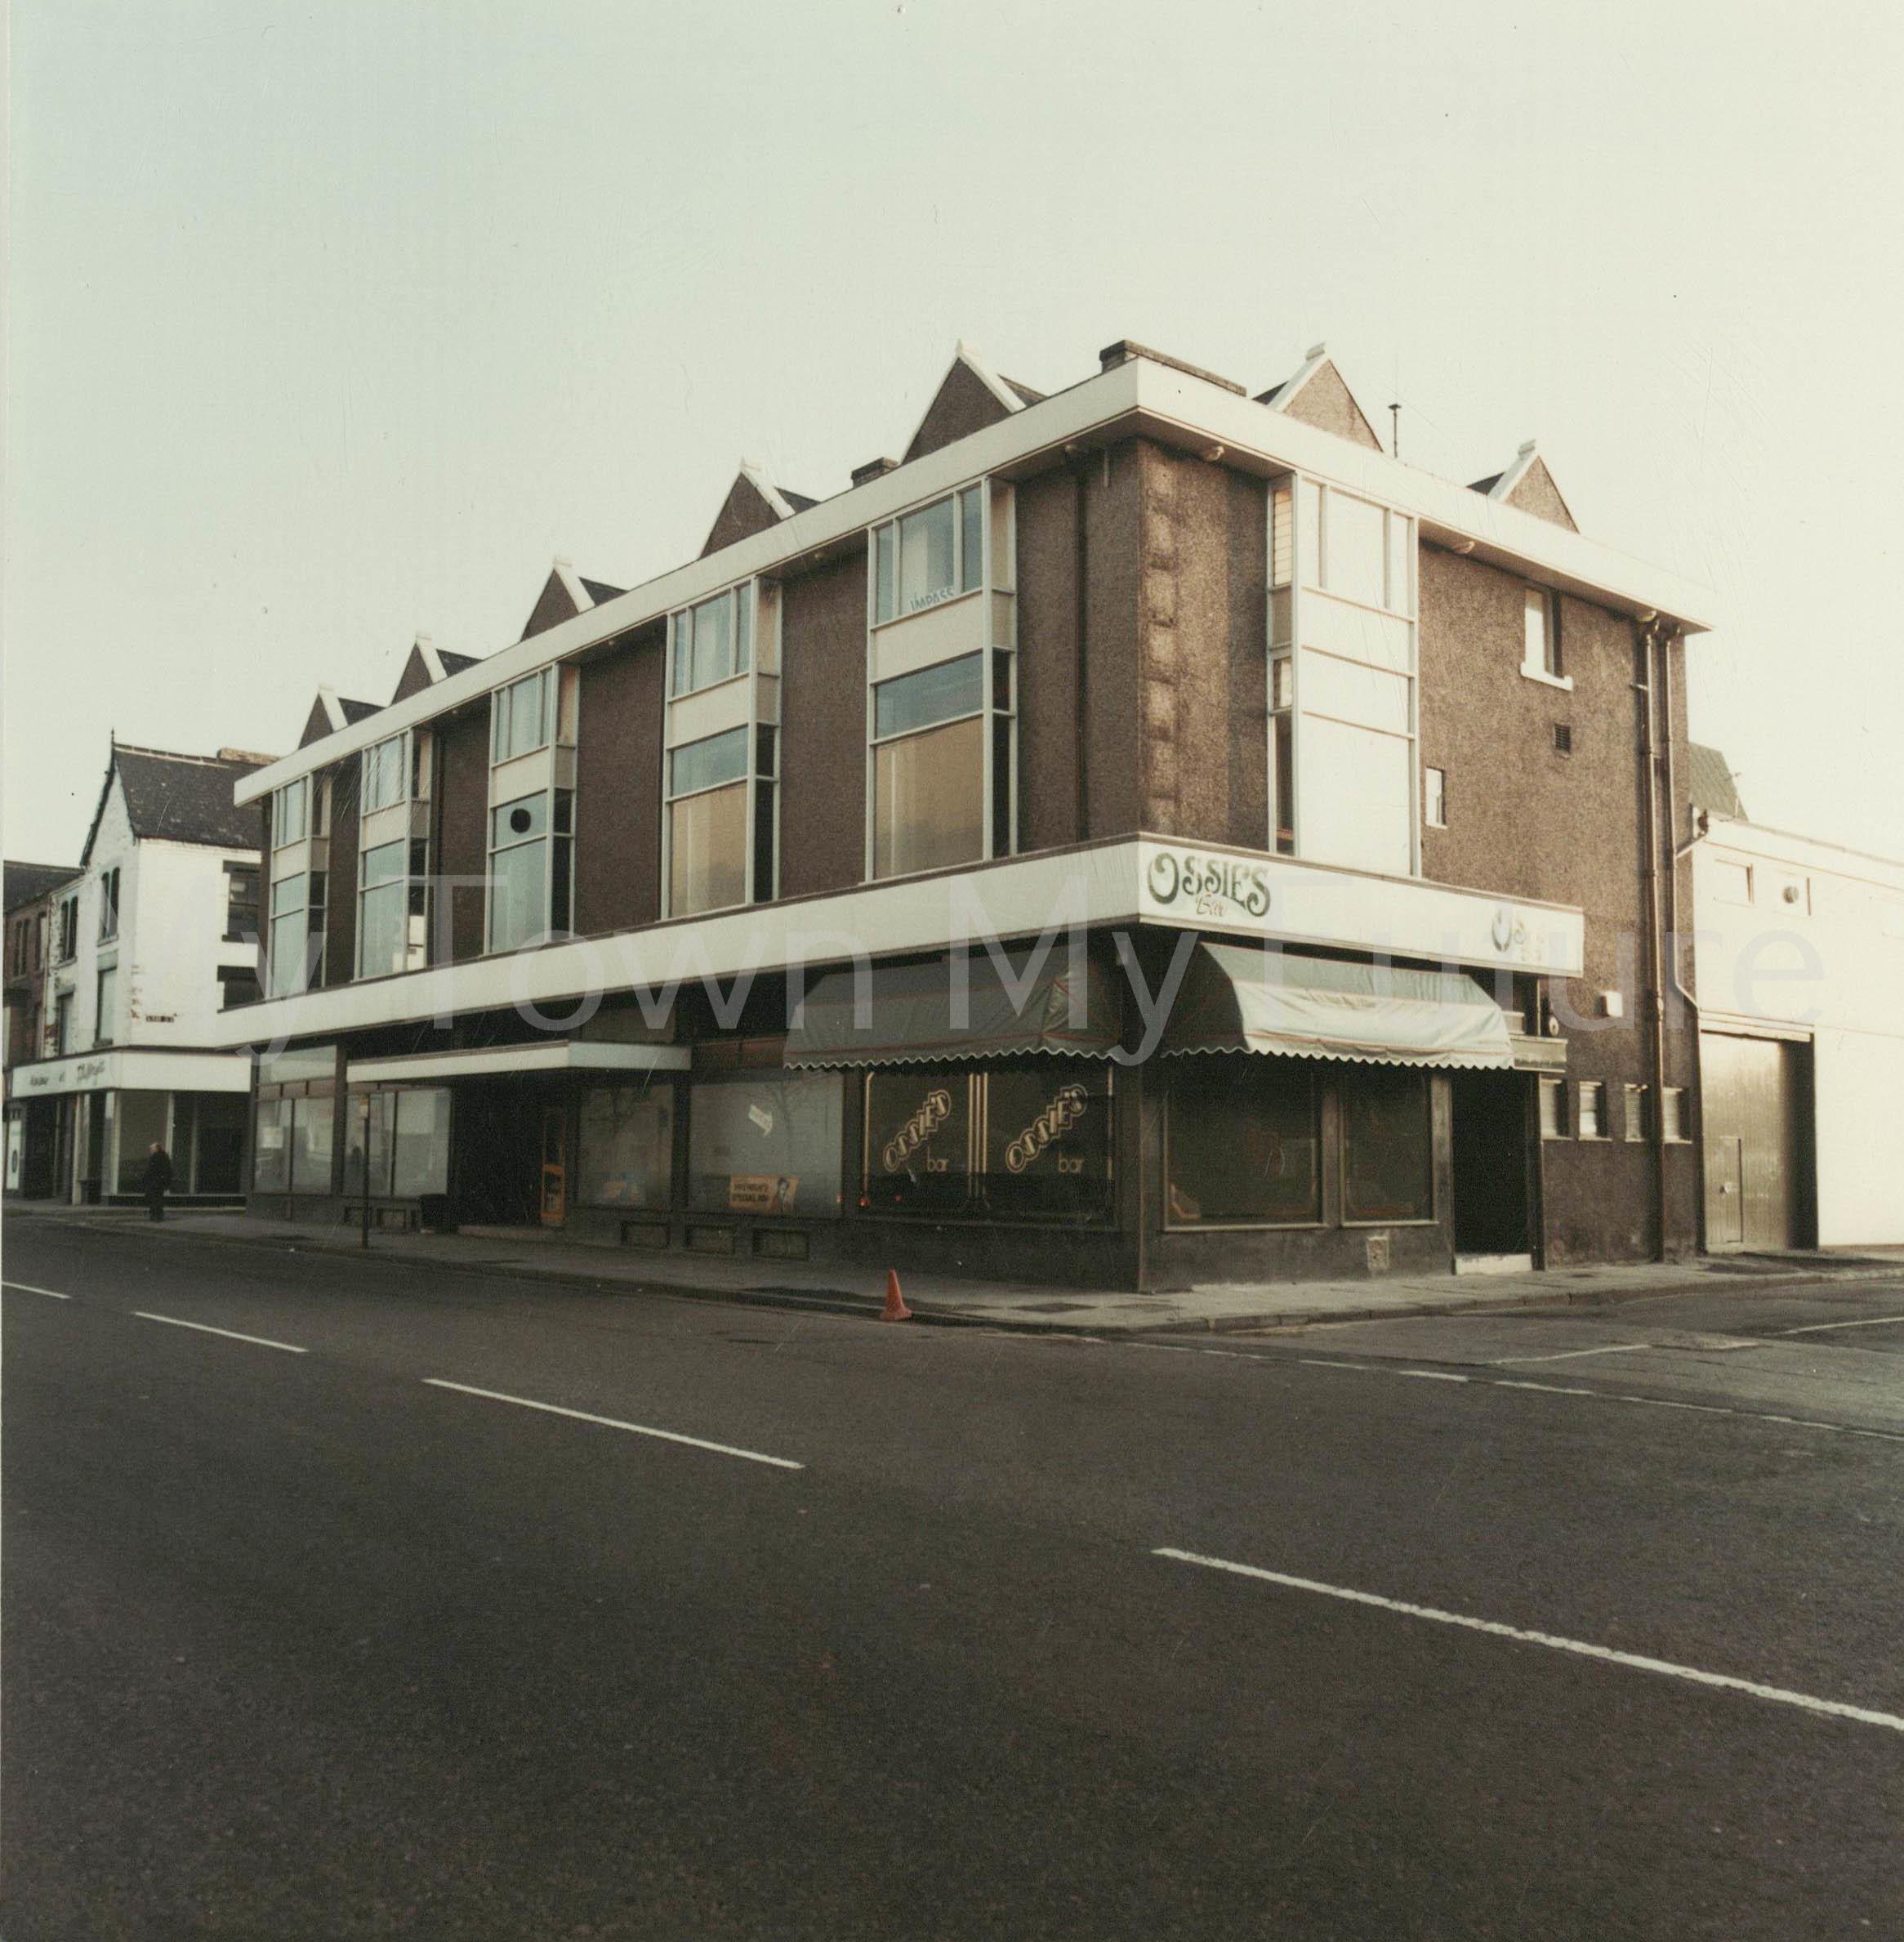 Ossies Bar,Corporation Road